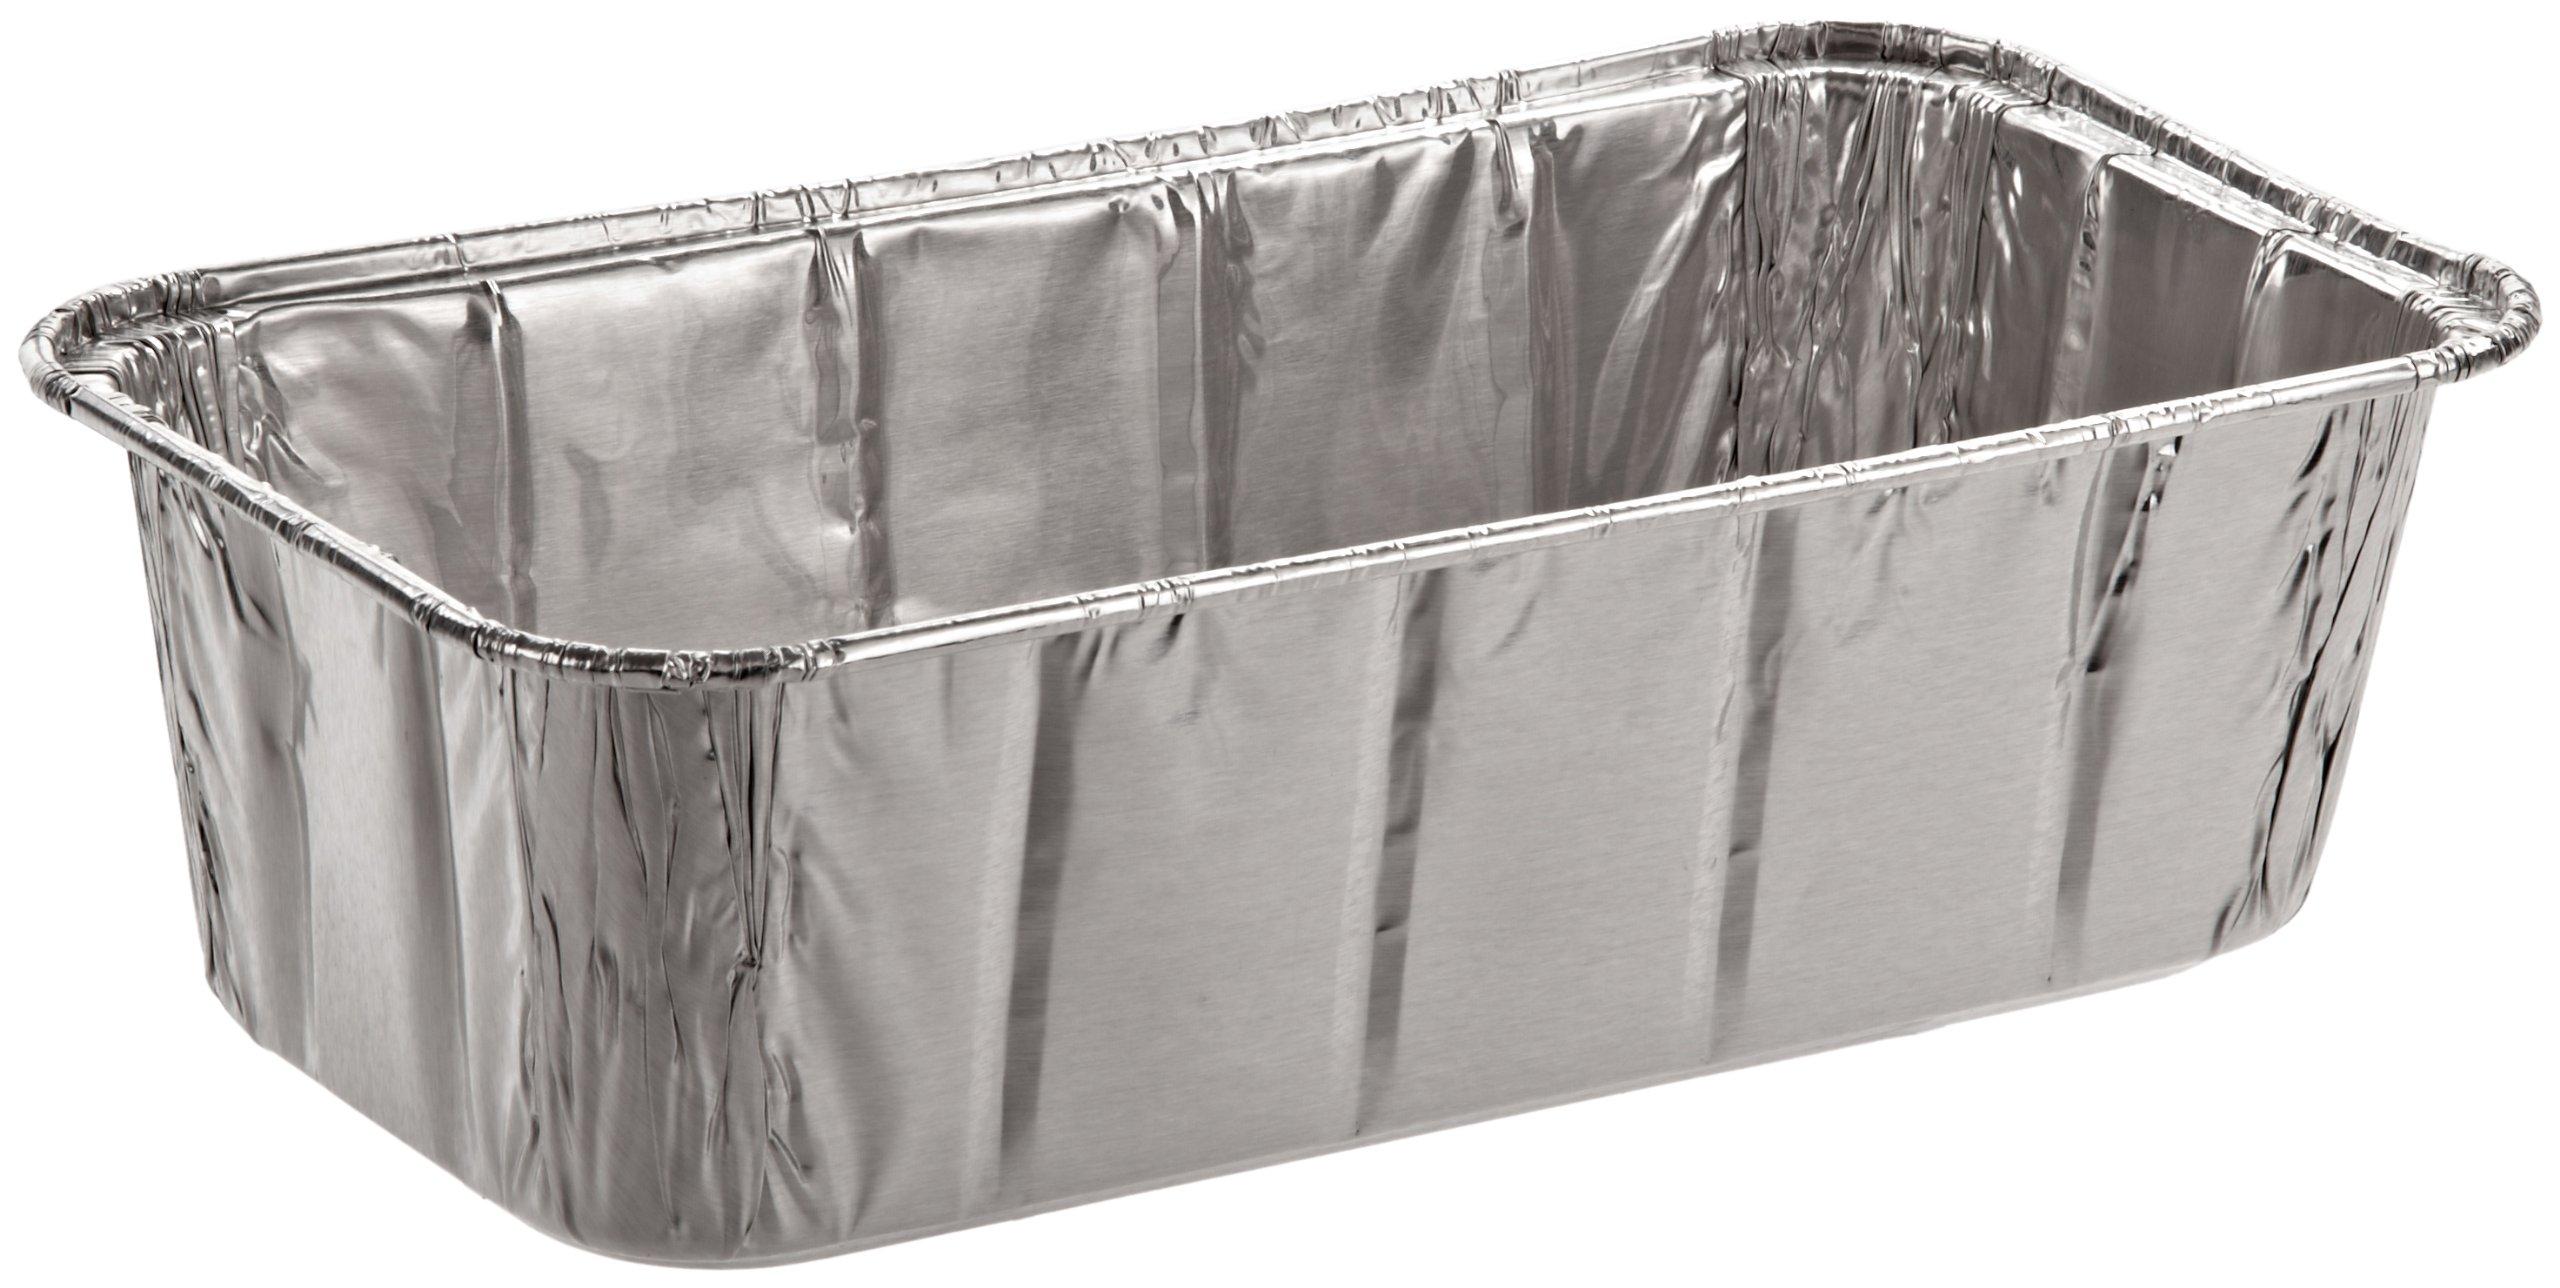 Handi-Foil of America 31630 Aluminum Baking Pan, 2 Loaf, 8w x 3 7/8d x 2 19/32h (Case of 200)